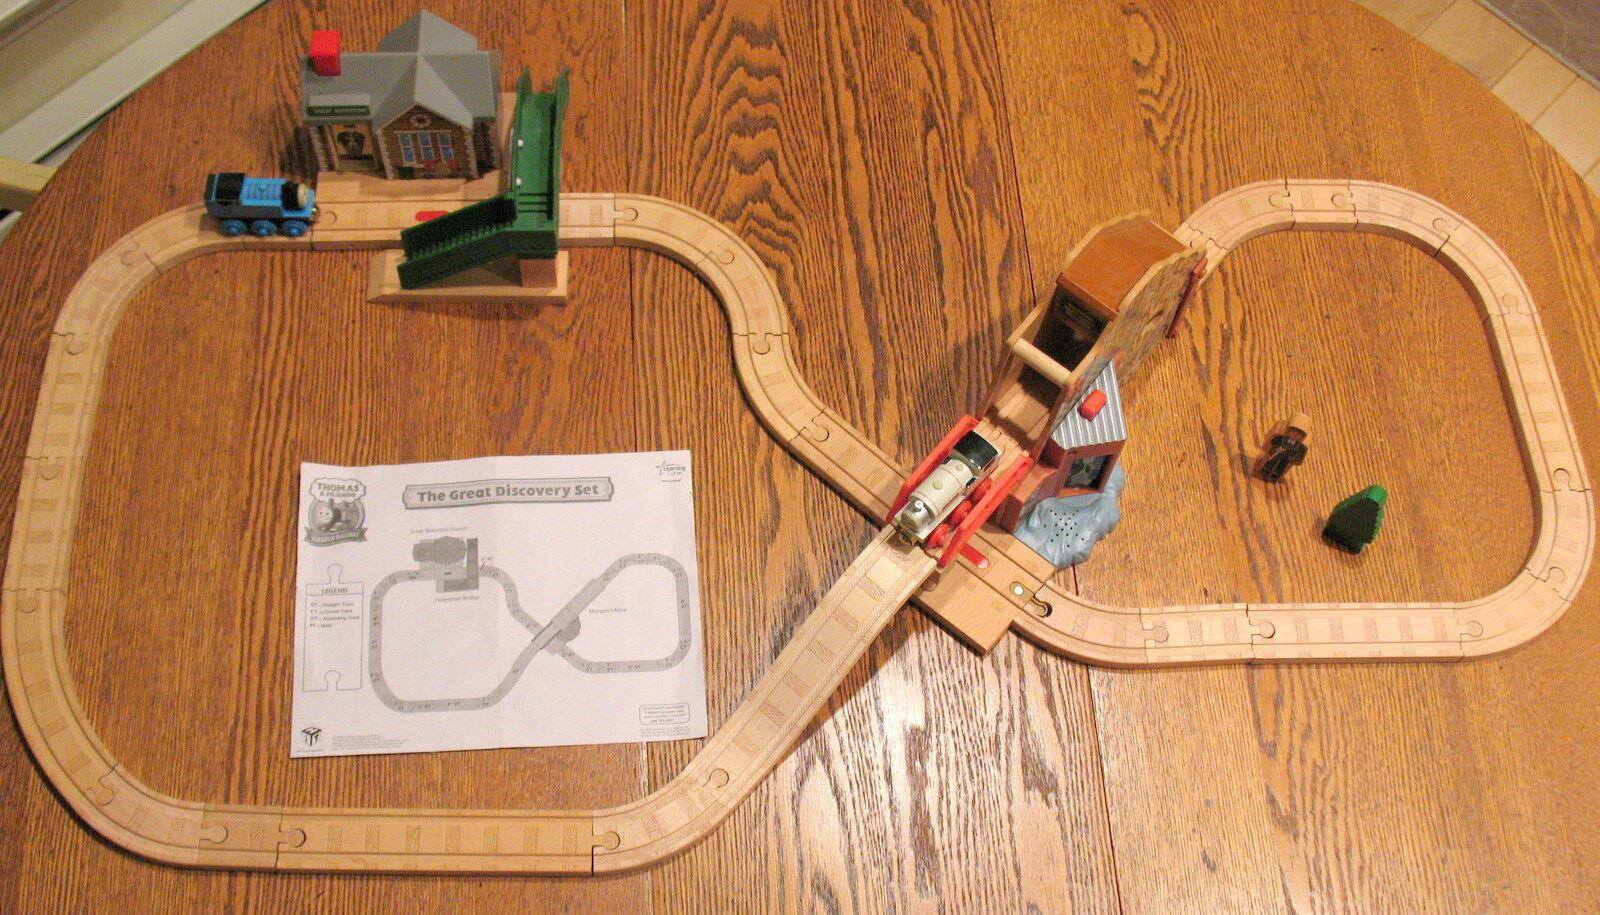 Conjunto, Thomas THE GREAT DISCOVERY Wooden Railway learnng Curve 2008 Usado En Excelente Condición